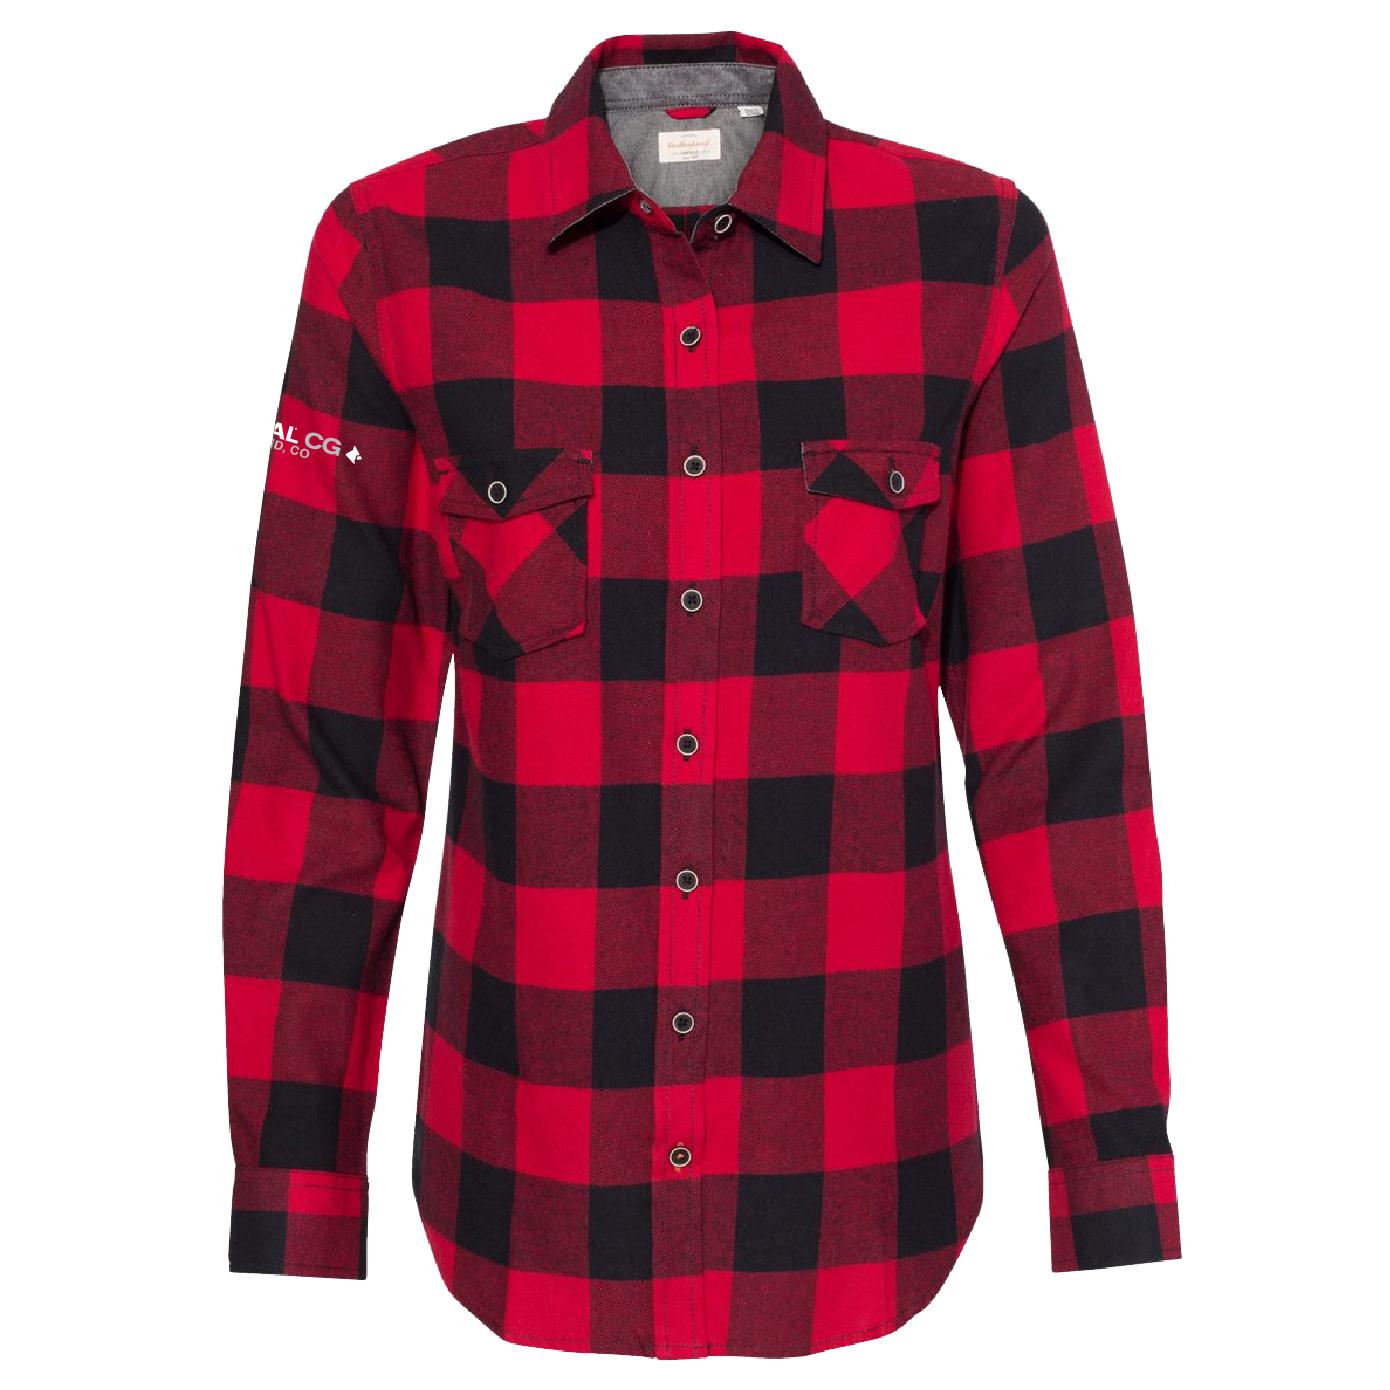 Weatherproof Weatherproof  Women's Vintage Brushed Flannel Long Sleeve Shirt (Crimson/Black)